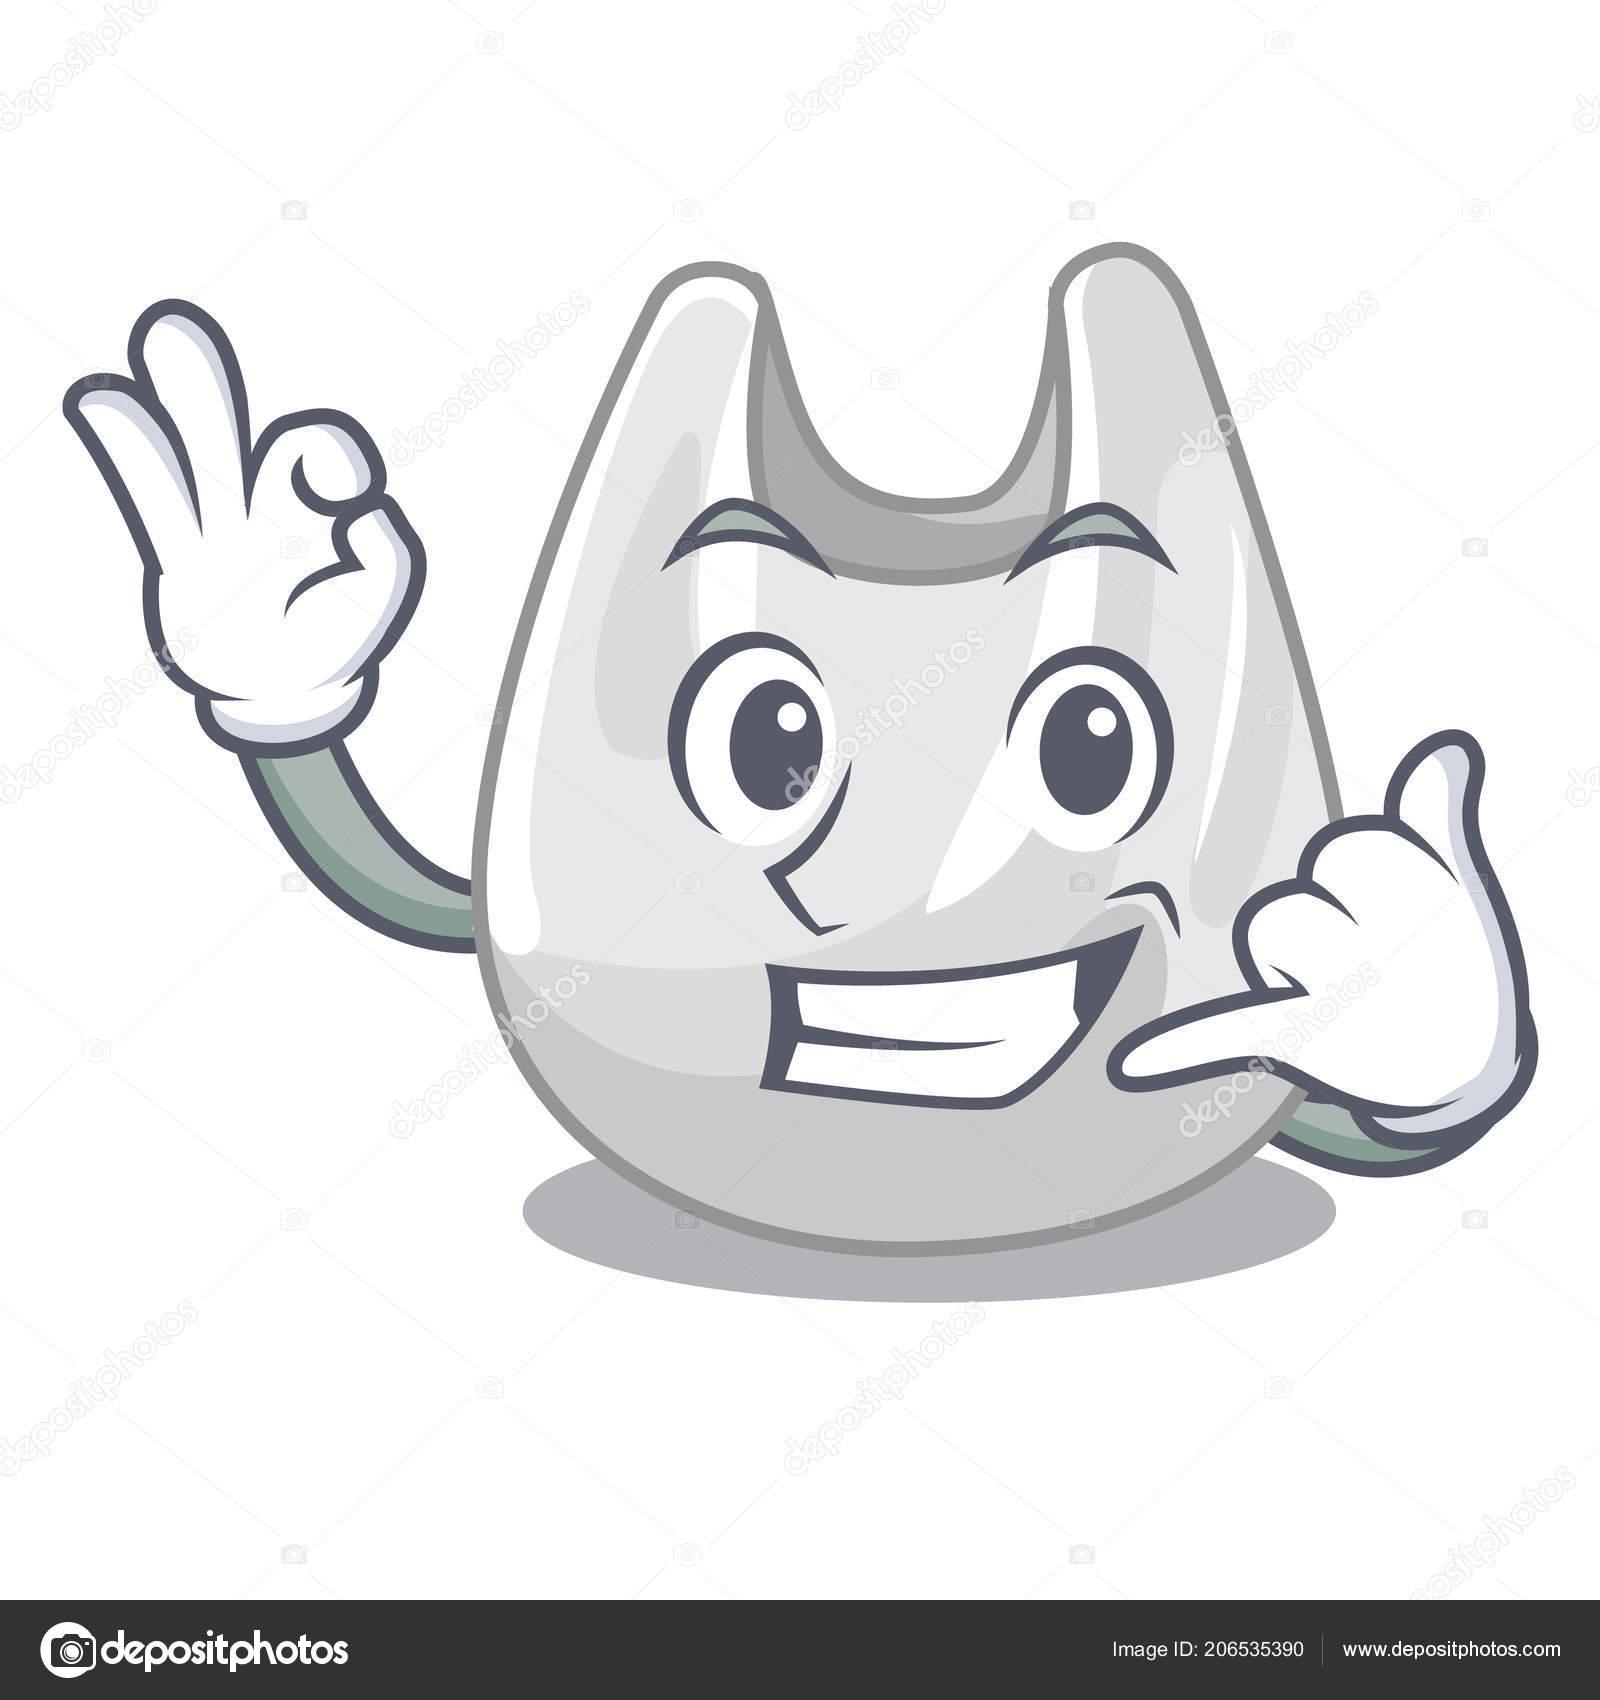 Me Llaman Dibujos Animados Mascota De Bolsa De Plástico Archivo